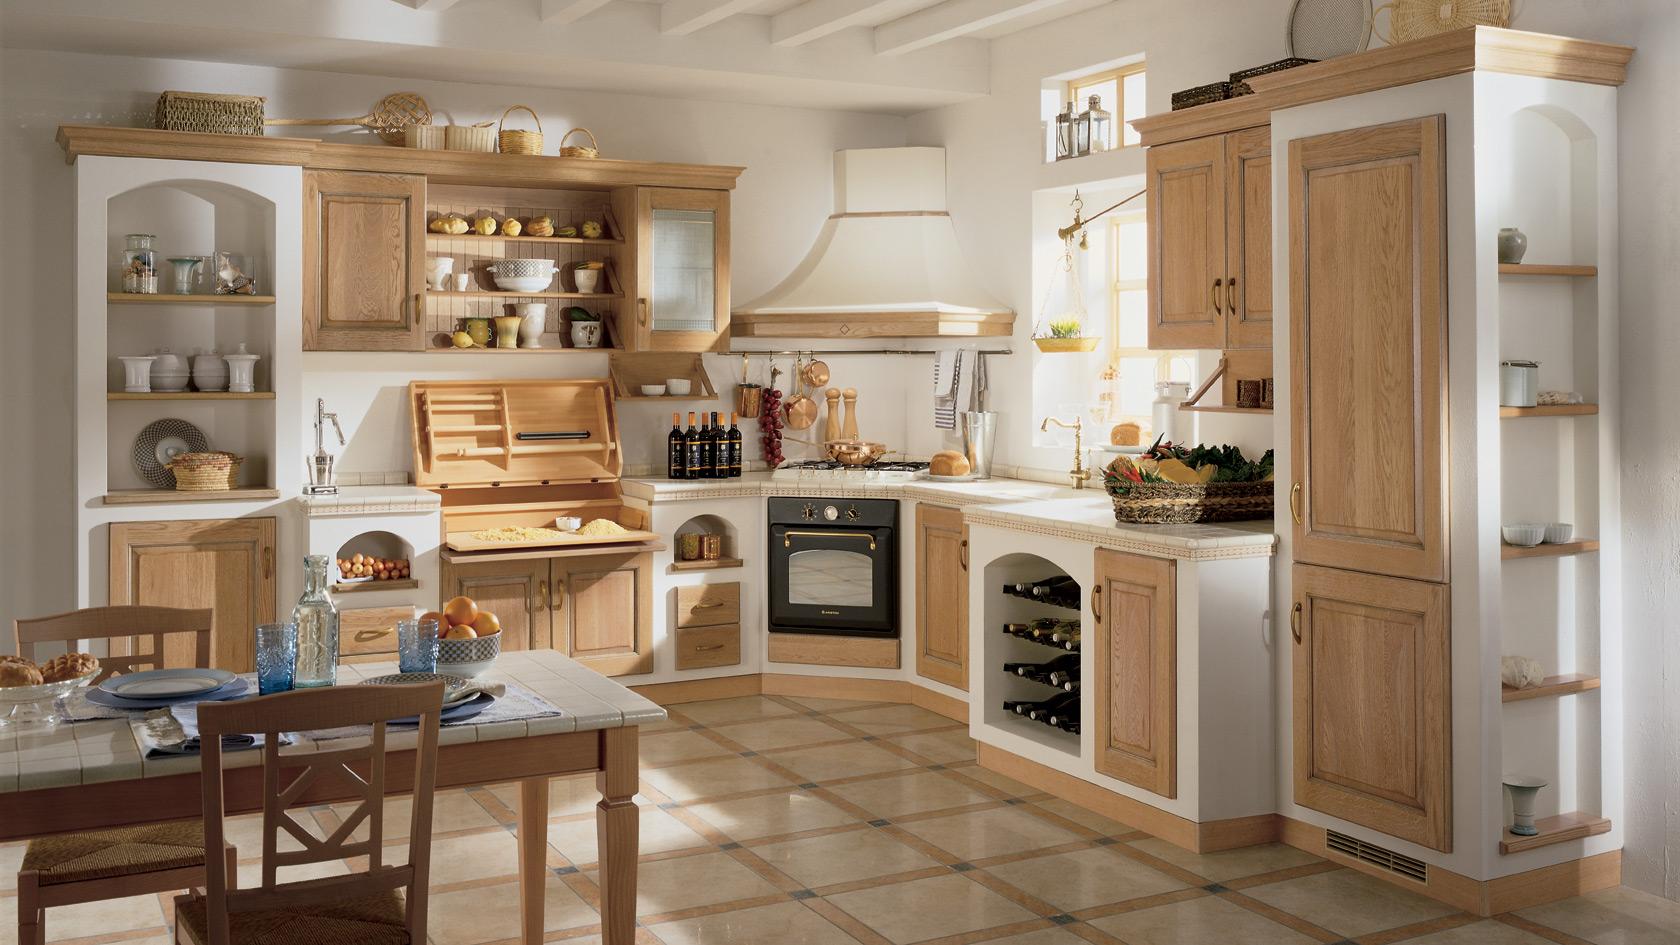 Come Decorare Una Cucina Rustica come arredare una cucina classica |